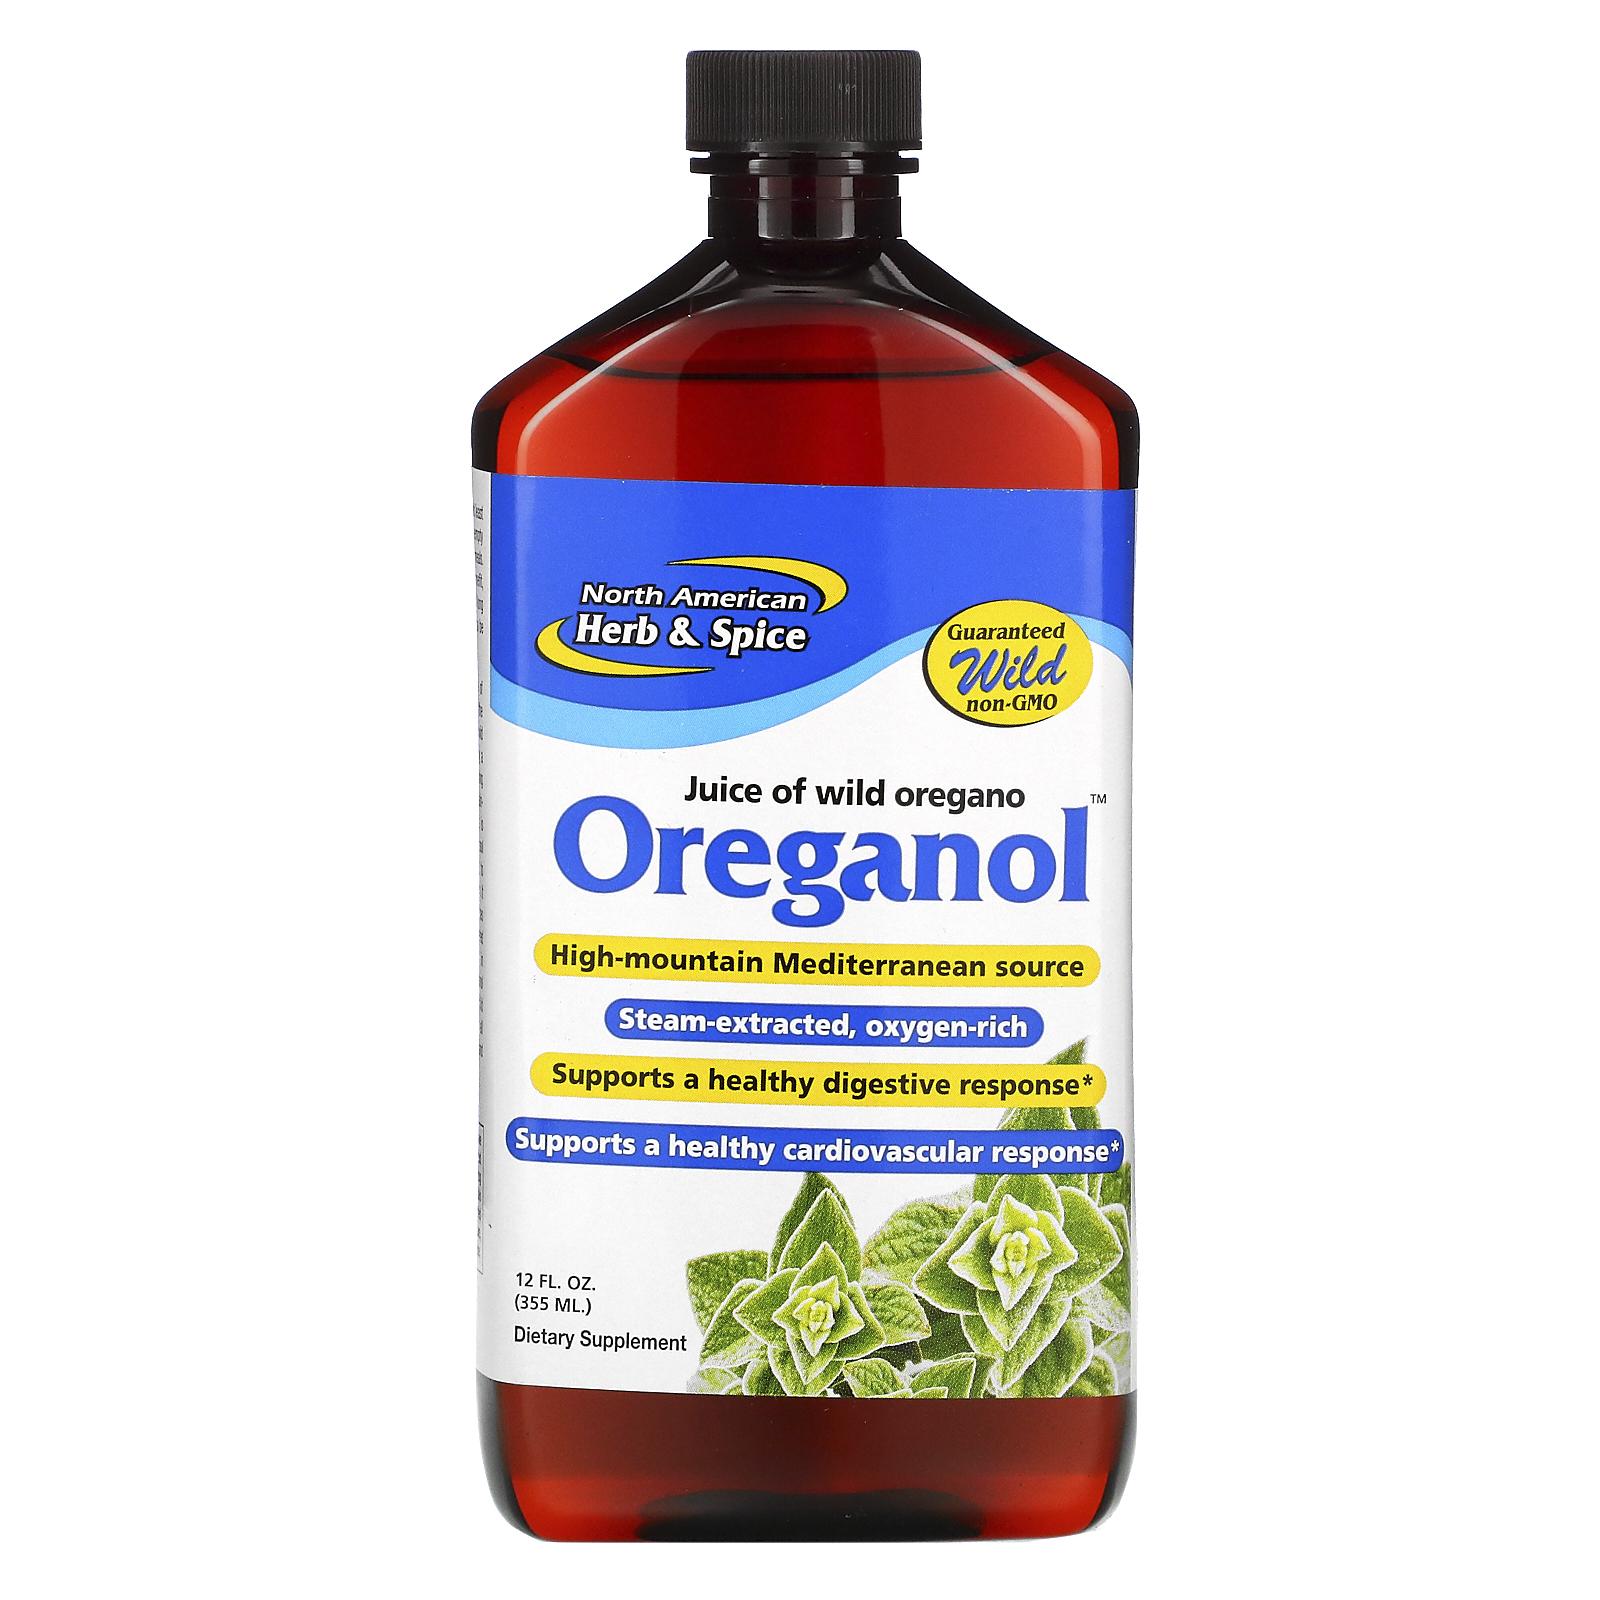 North American Herb Spice Oreganol Wild Mediterranean P73 12 Fl Oz 355 Ml Iherb